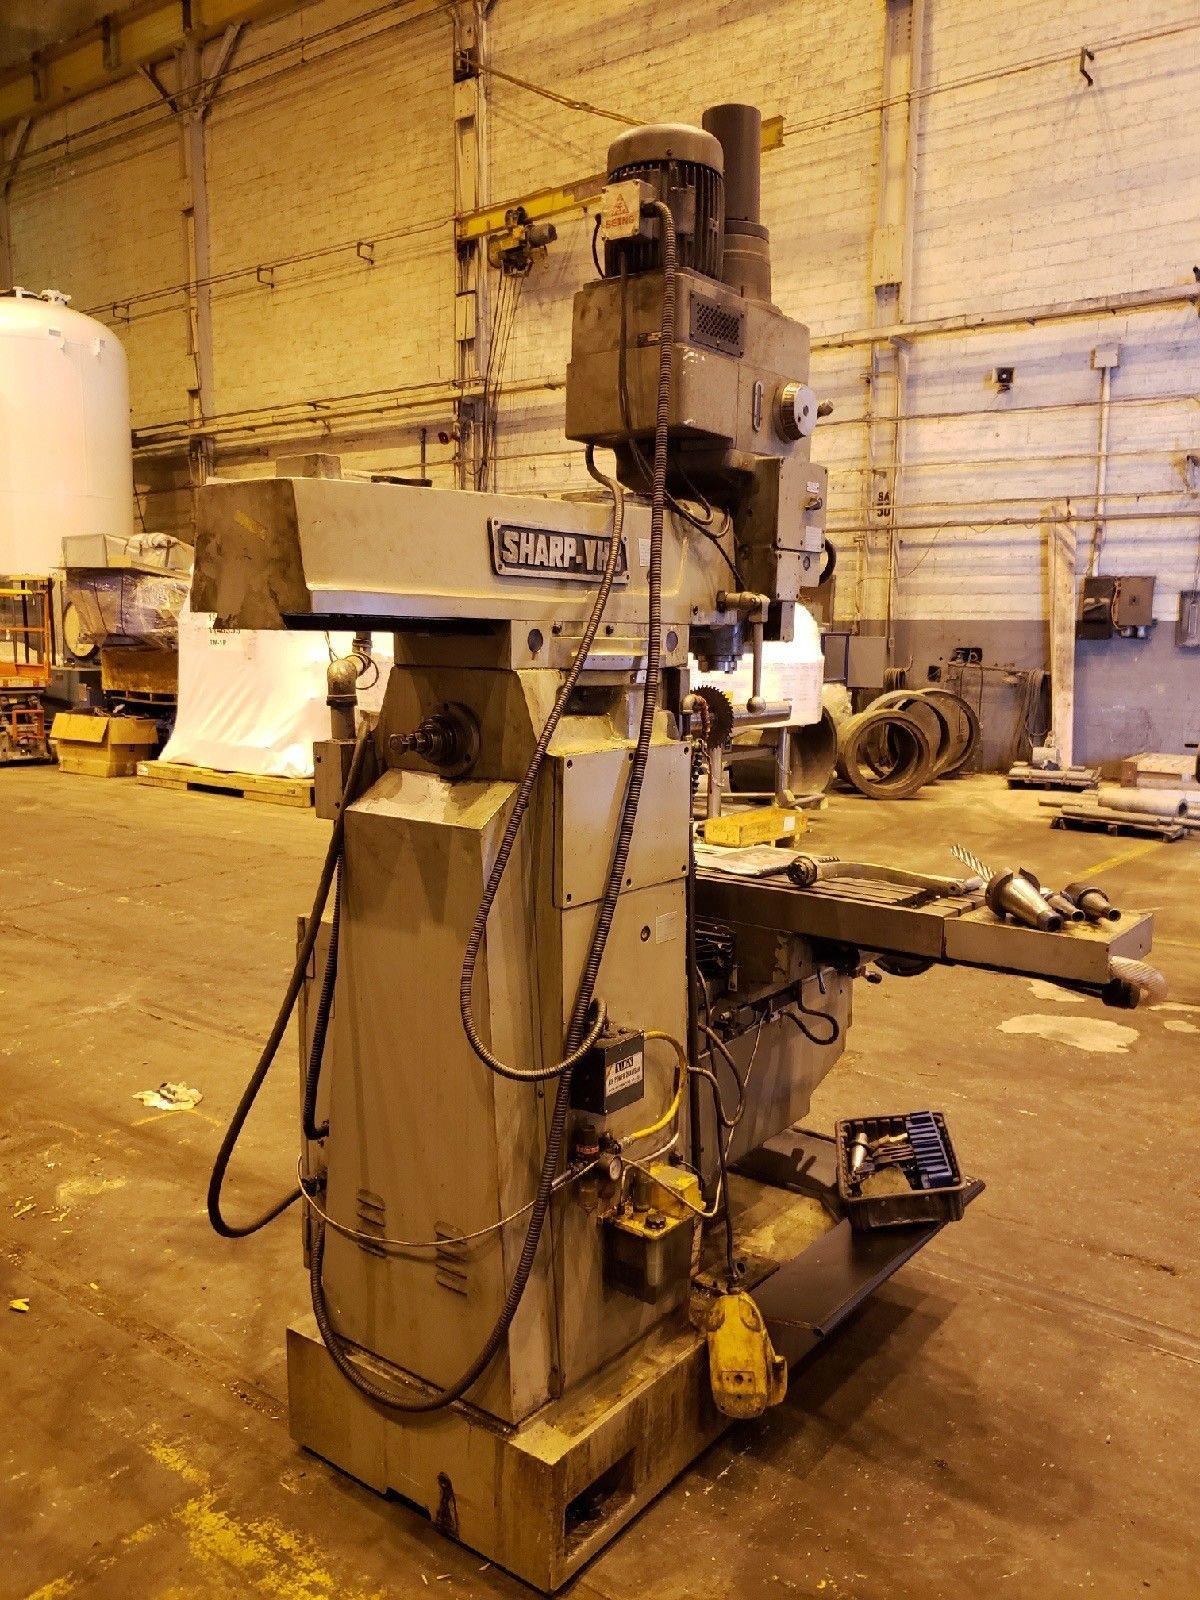 Lot 30D - 1999 Sharp VH3 Vertical Horizontal Mill Milling Machining Machine - Free Loading